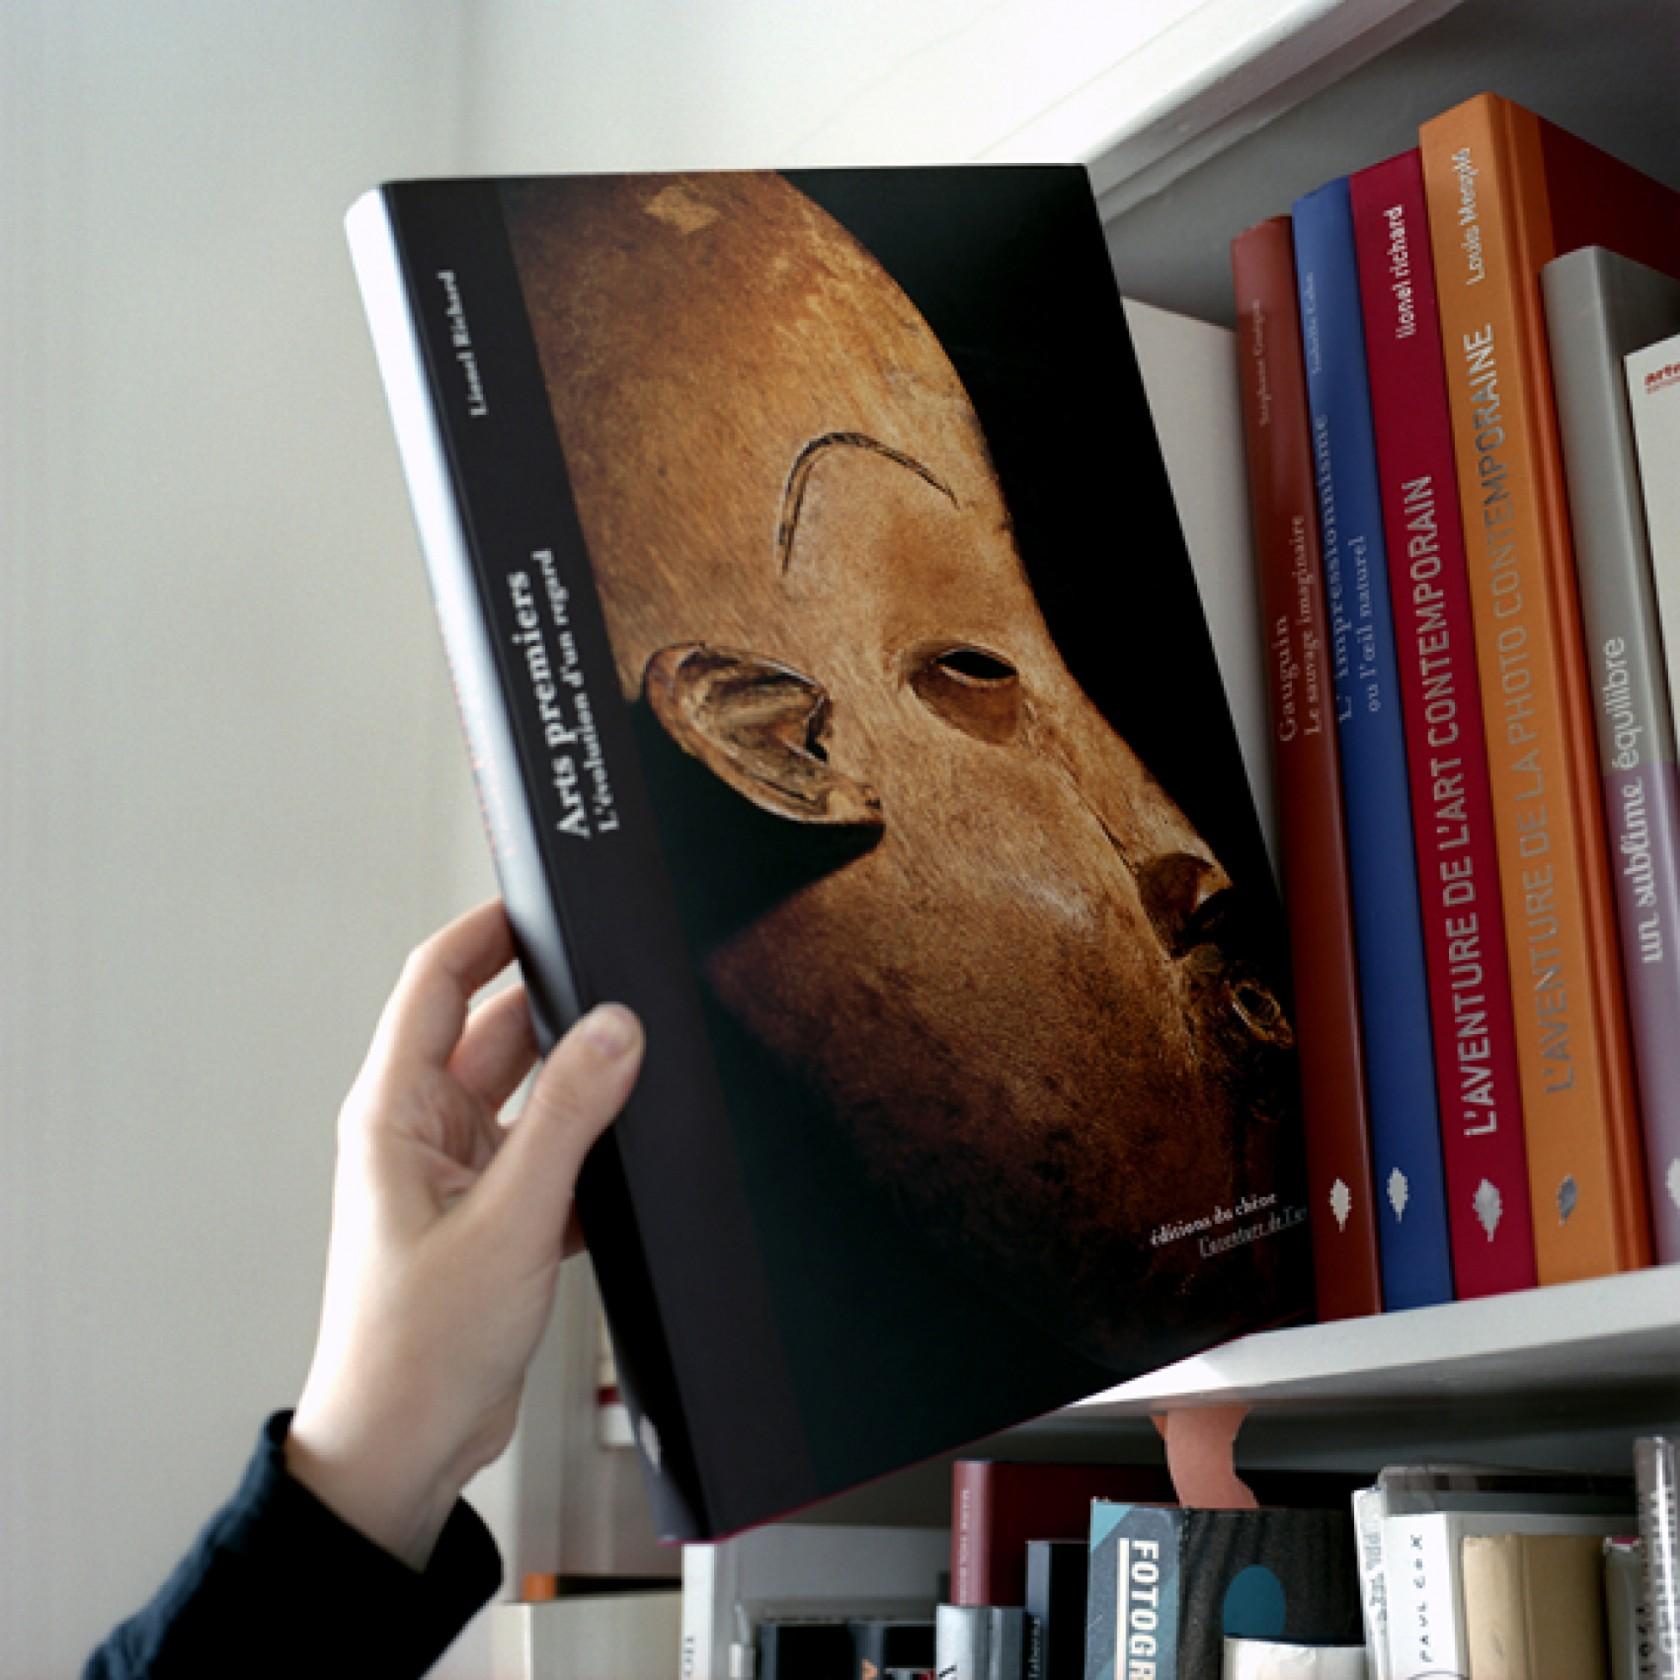 fouinzanardi -  fz_print.books_editionsduchene6